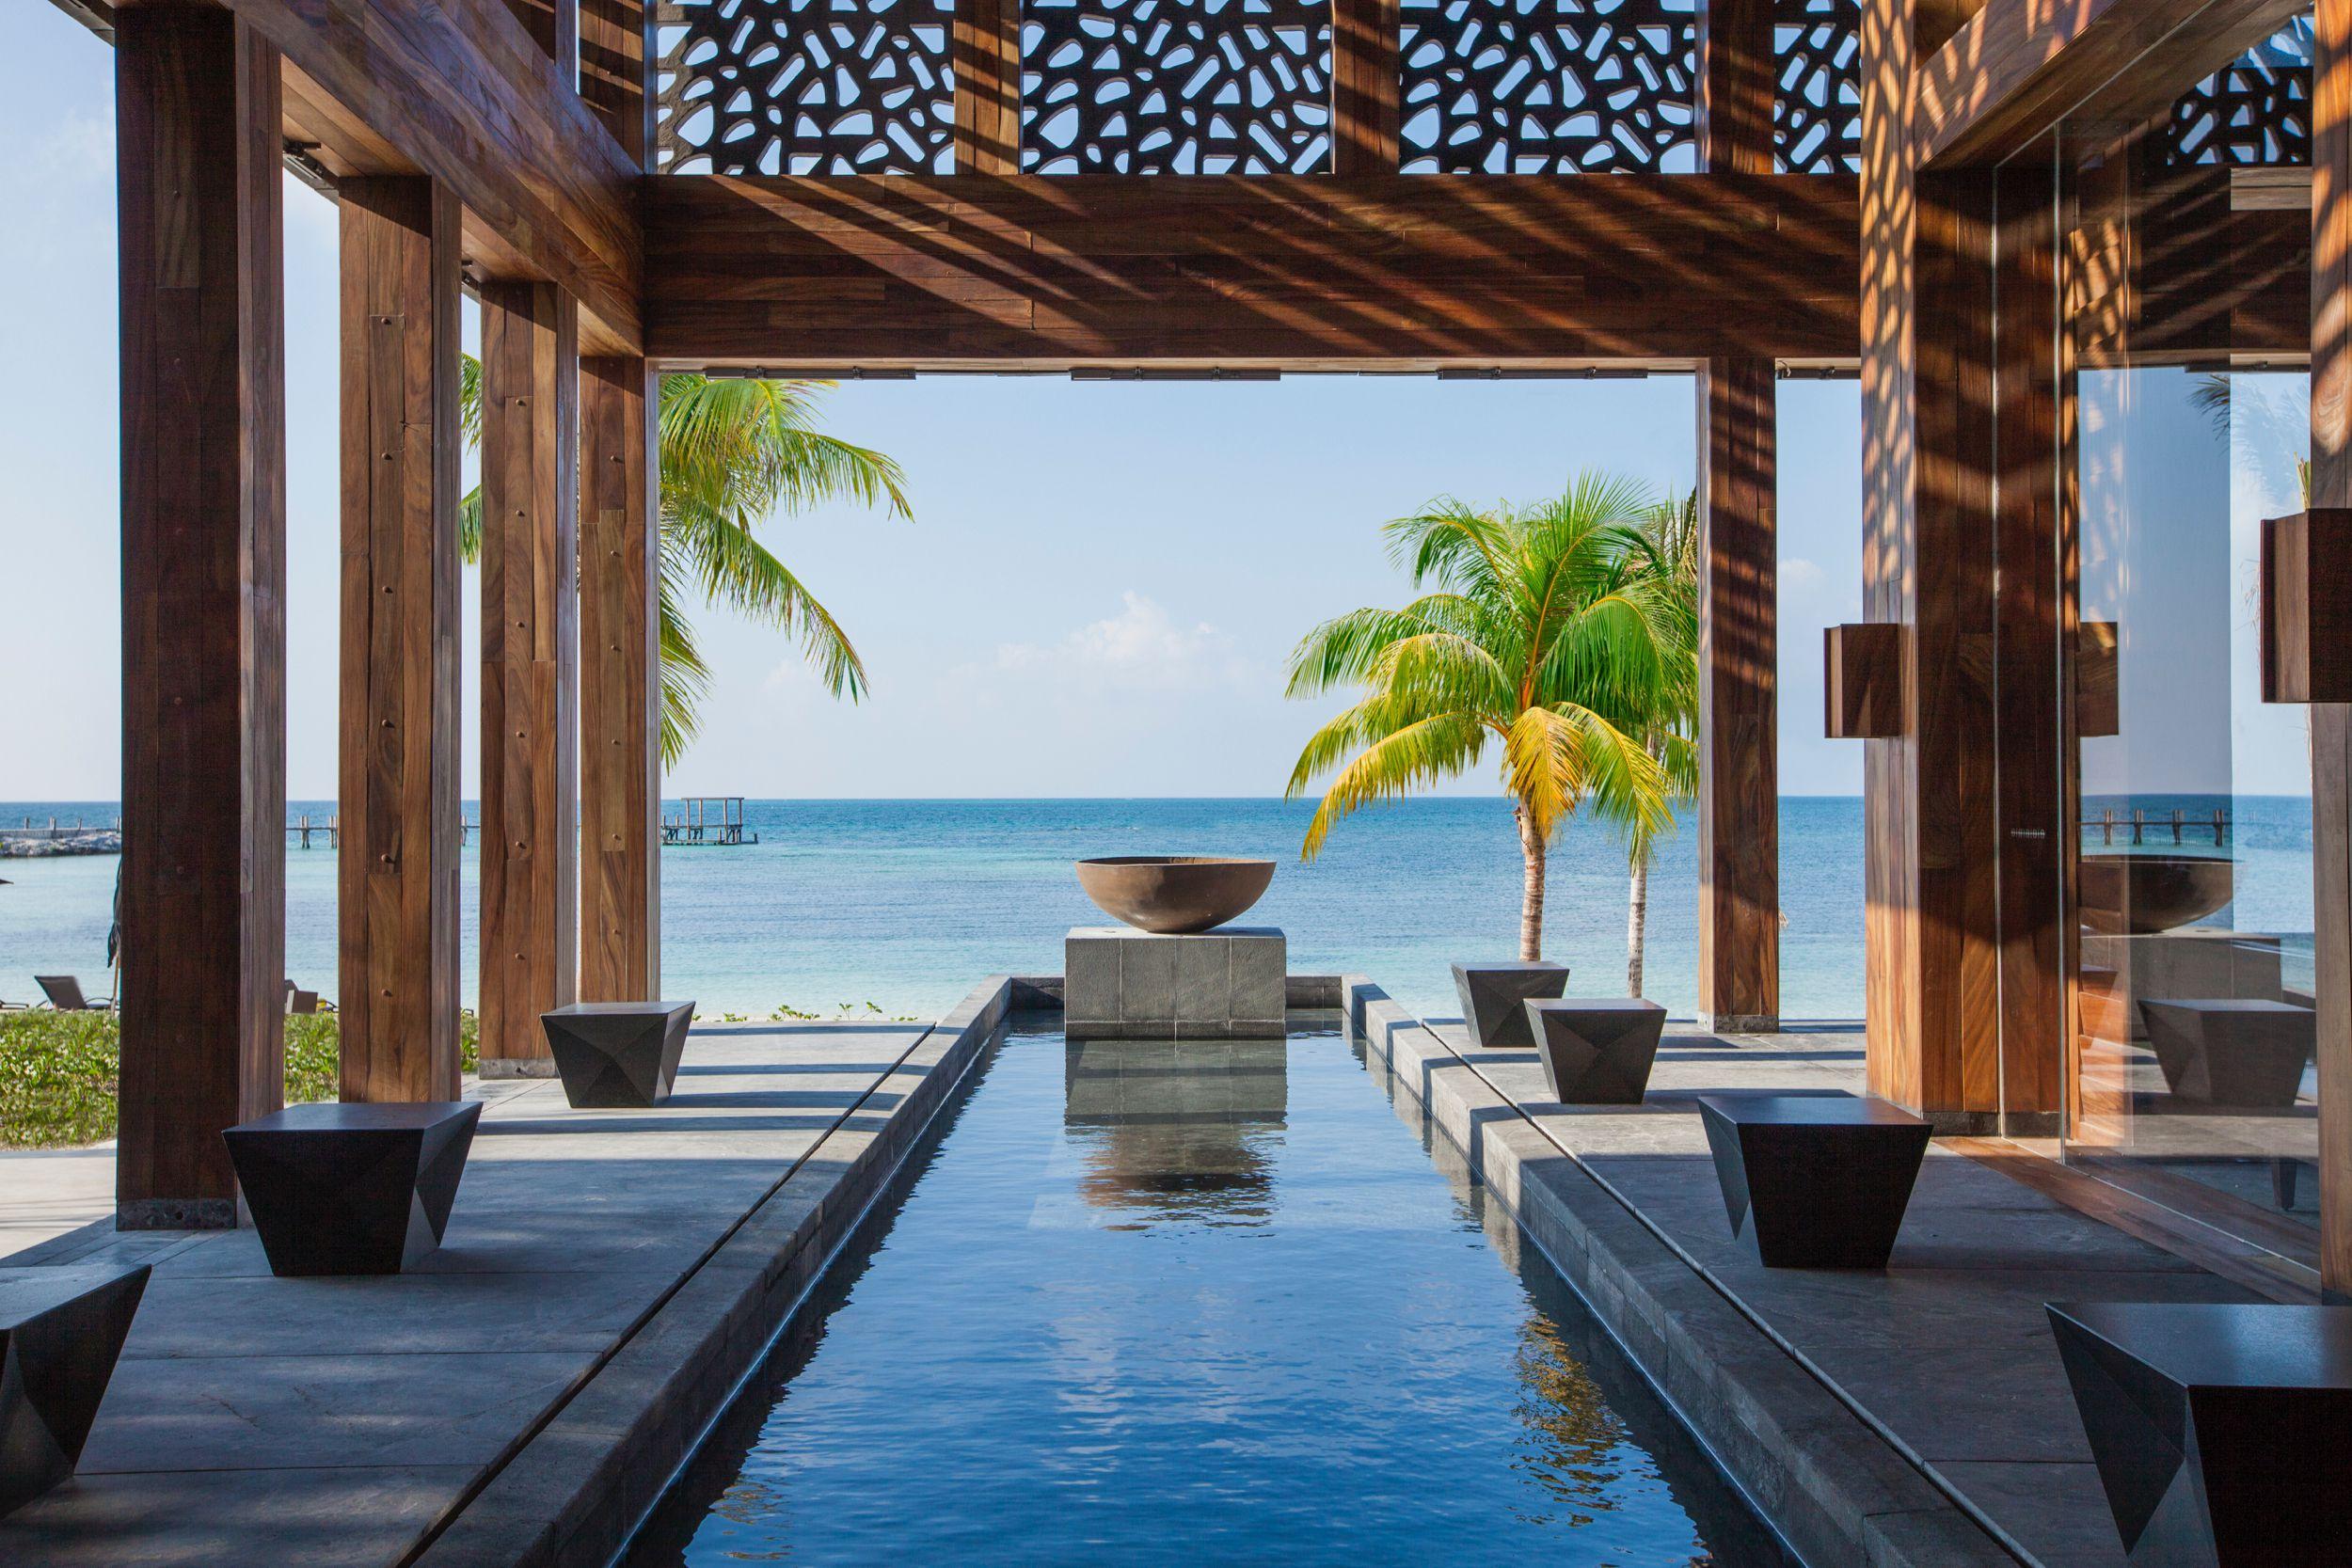 Caribbean-View-Nizuc-Resort-Hotel-Cancun-Mexico-59f7e976c412440011e35a5e.jpg